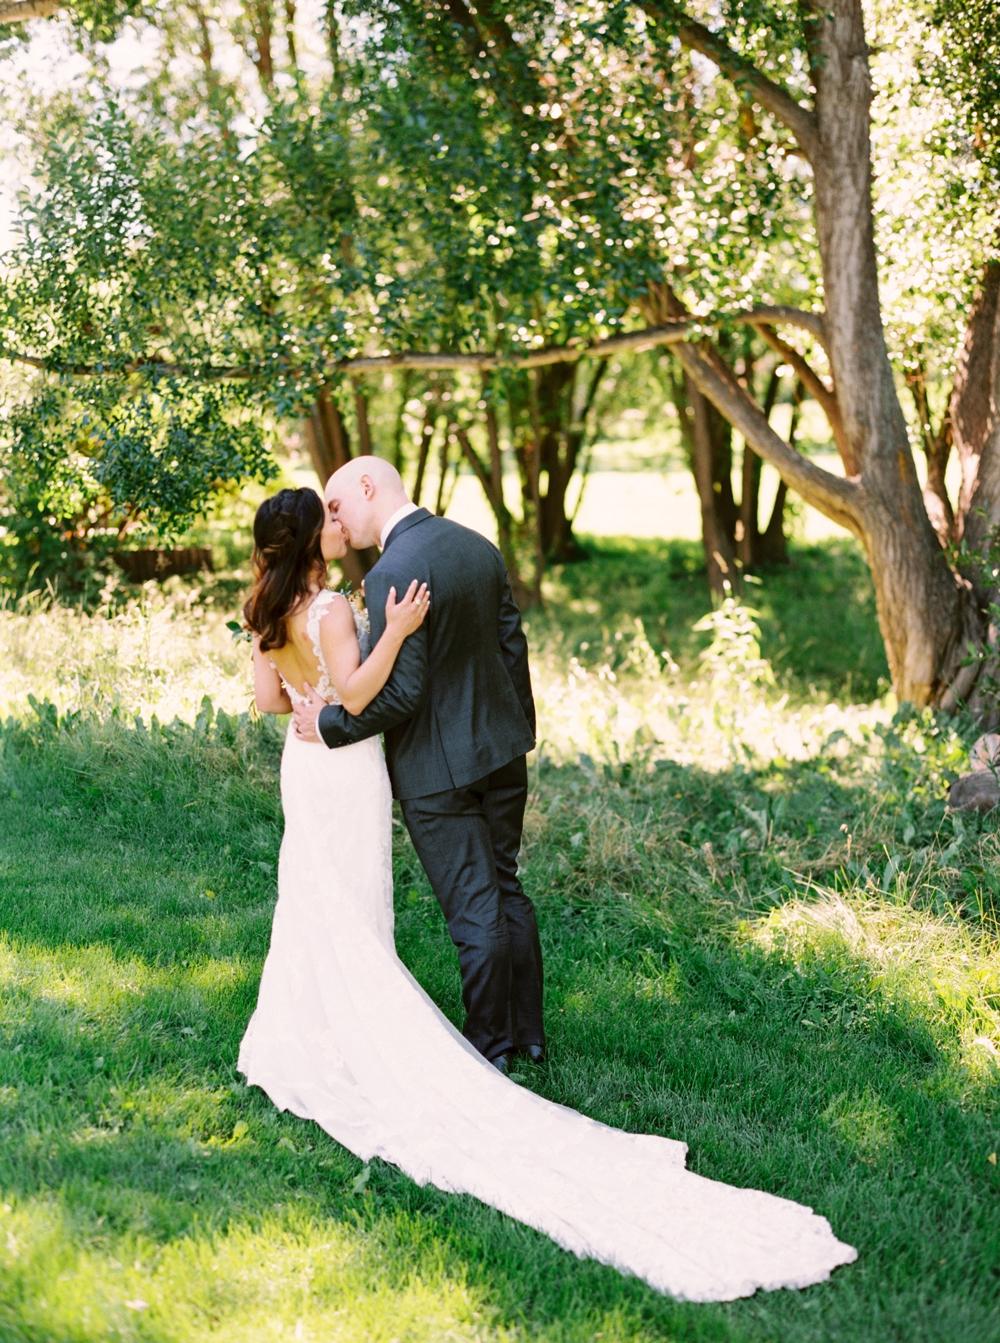 Calgary Wedding Photographer | Meadow Muse Pavilion Wedding | Canmore Photographers | Fish Creek Park | Bride & Groom